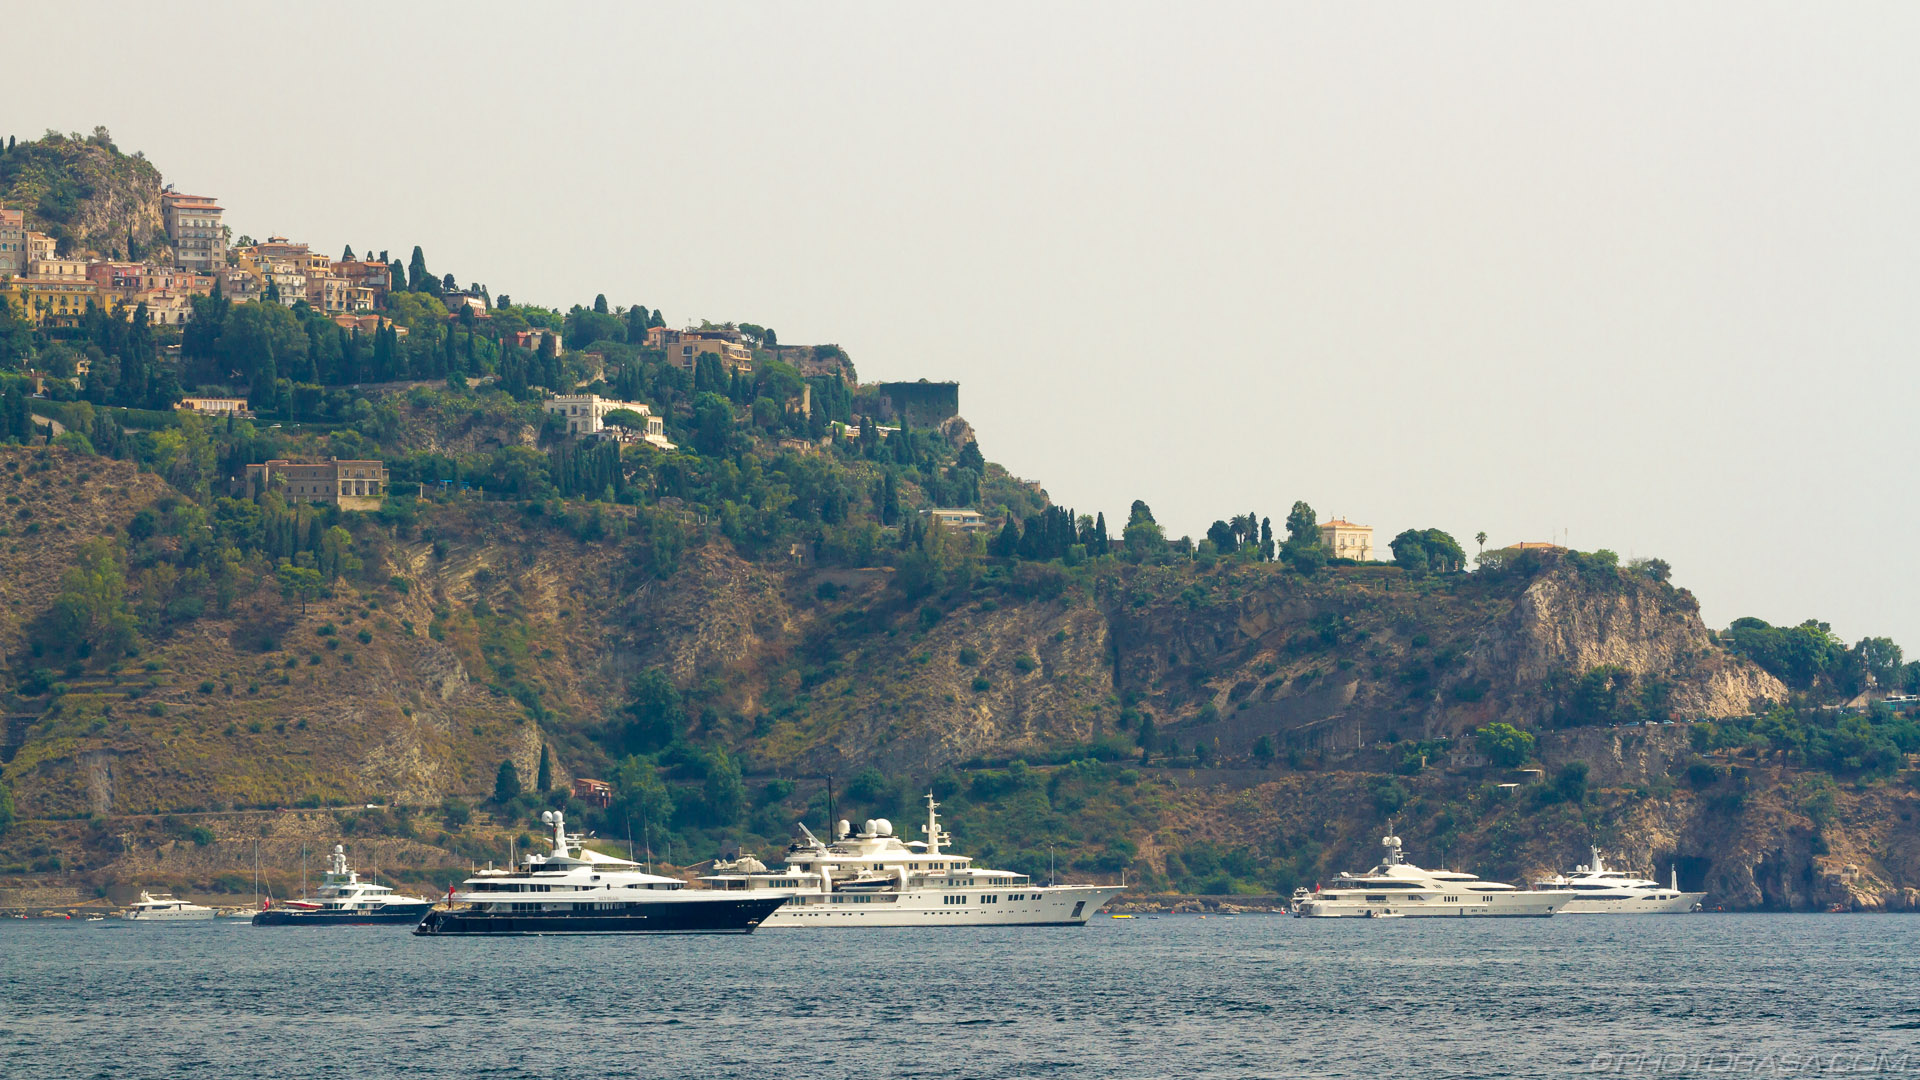 https://photorasa.com/giardini-naxos/group-of-super-yachts-near-giardini-naxos/